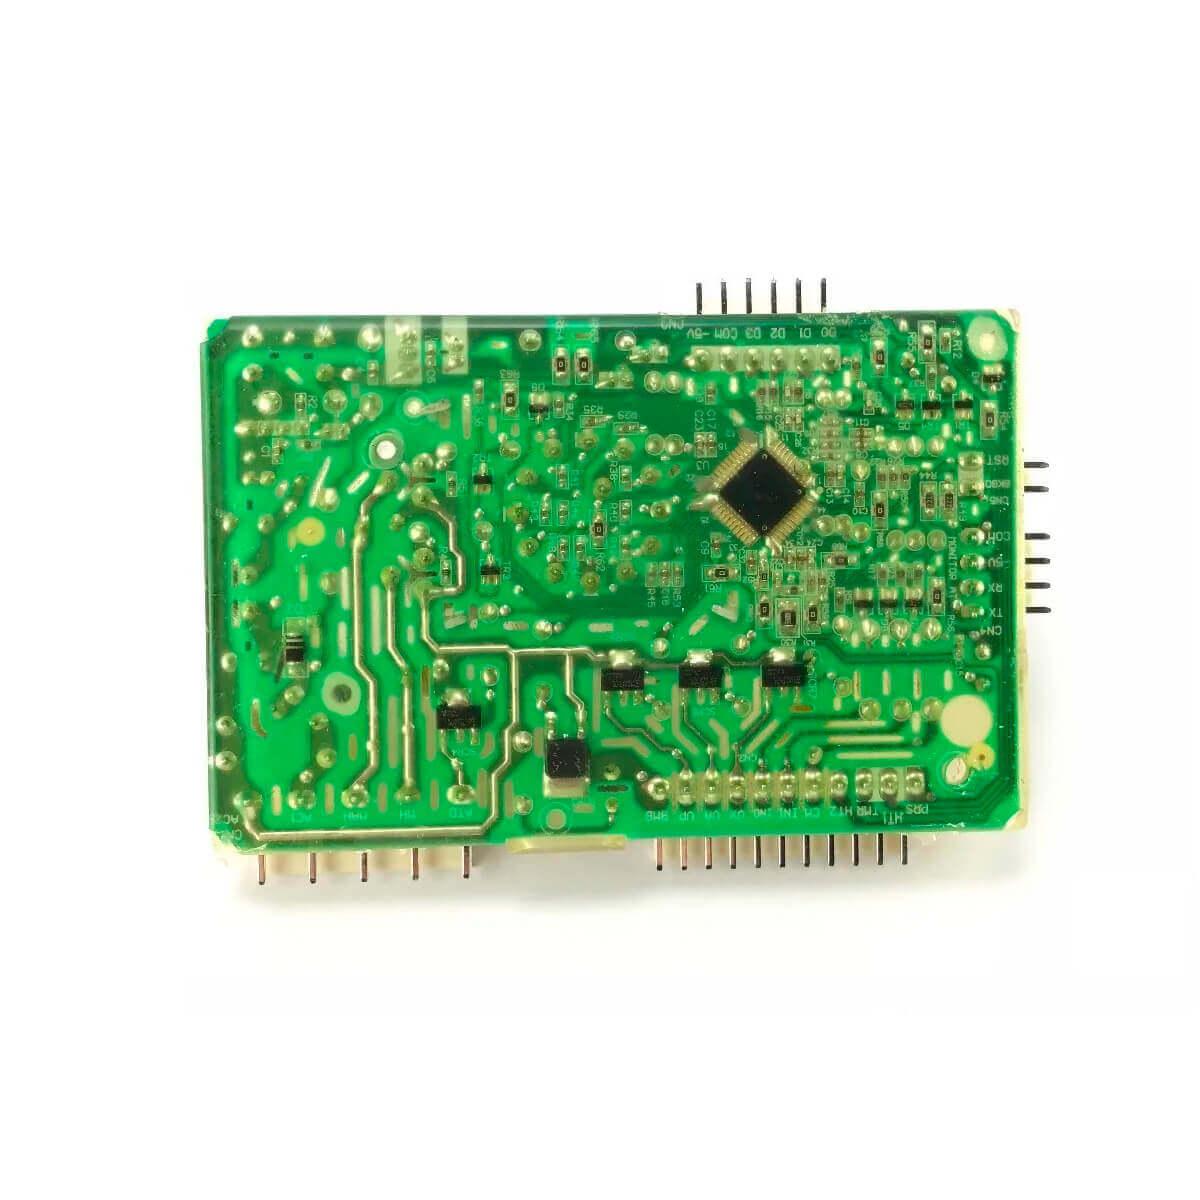 Placa Potencia Lavadoras de Roupas Electrolux Bivolt  LTE12 - 70202905